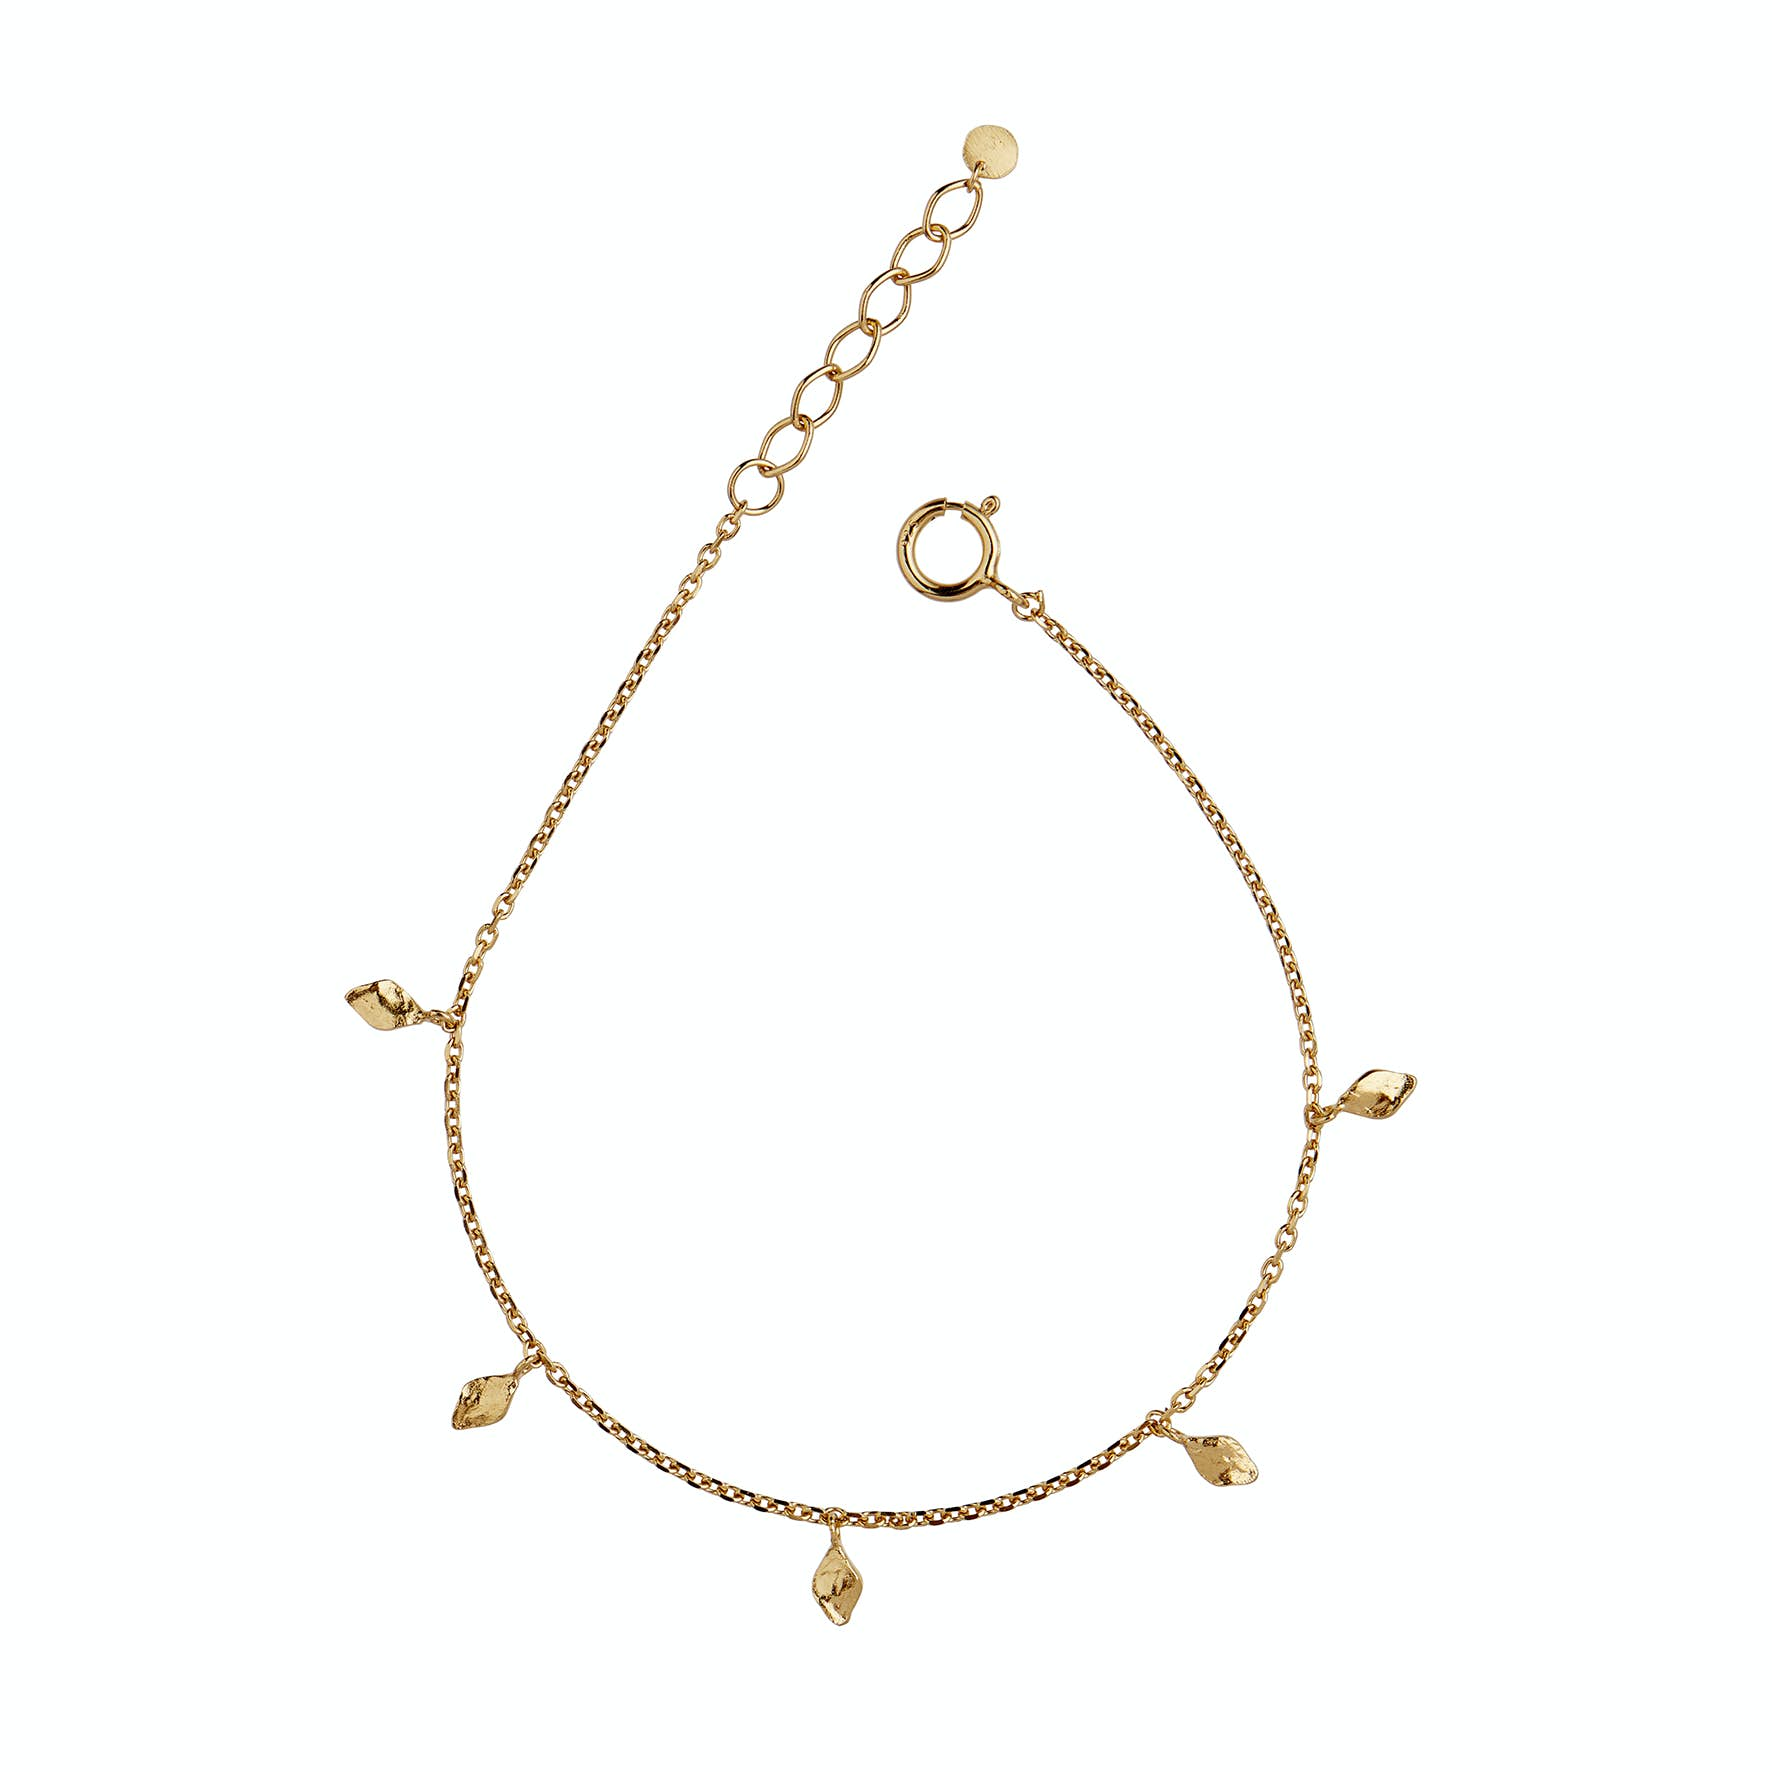 Tout Petit Ile De L'Amour Bracelet von STINE A Jewelry in Vergoldet-Silber Sterling 925